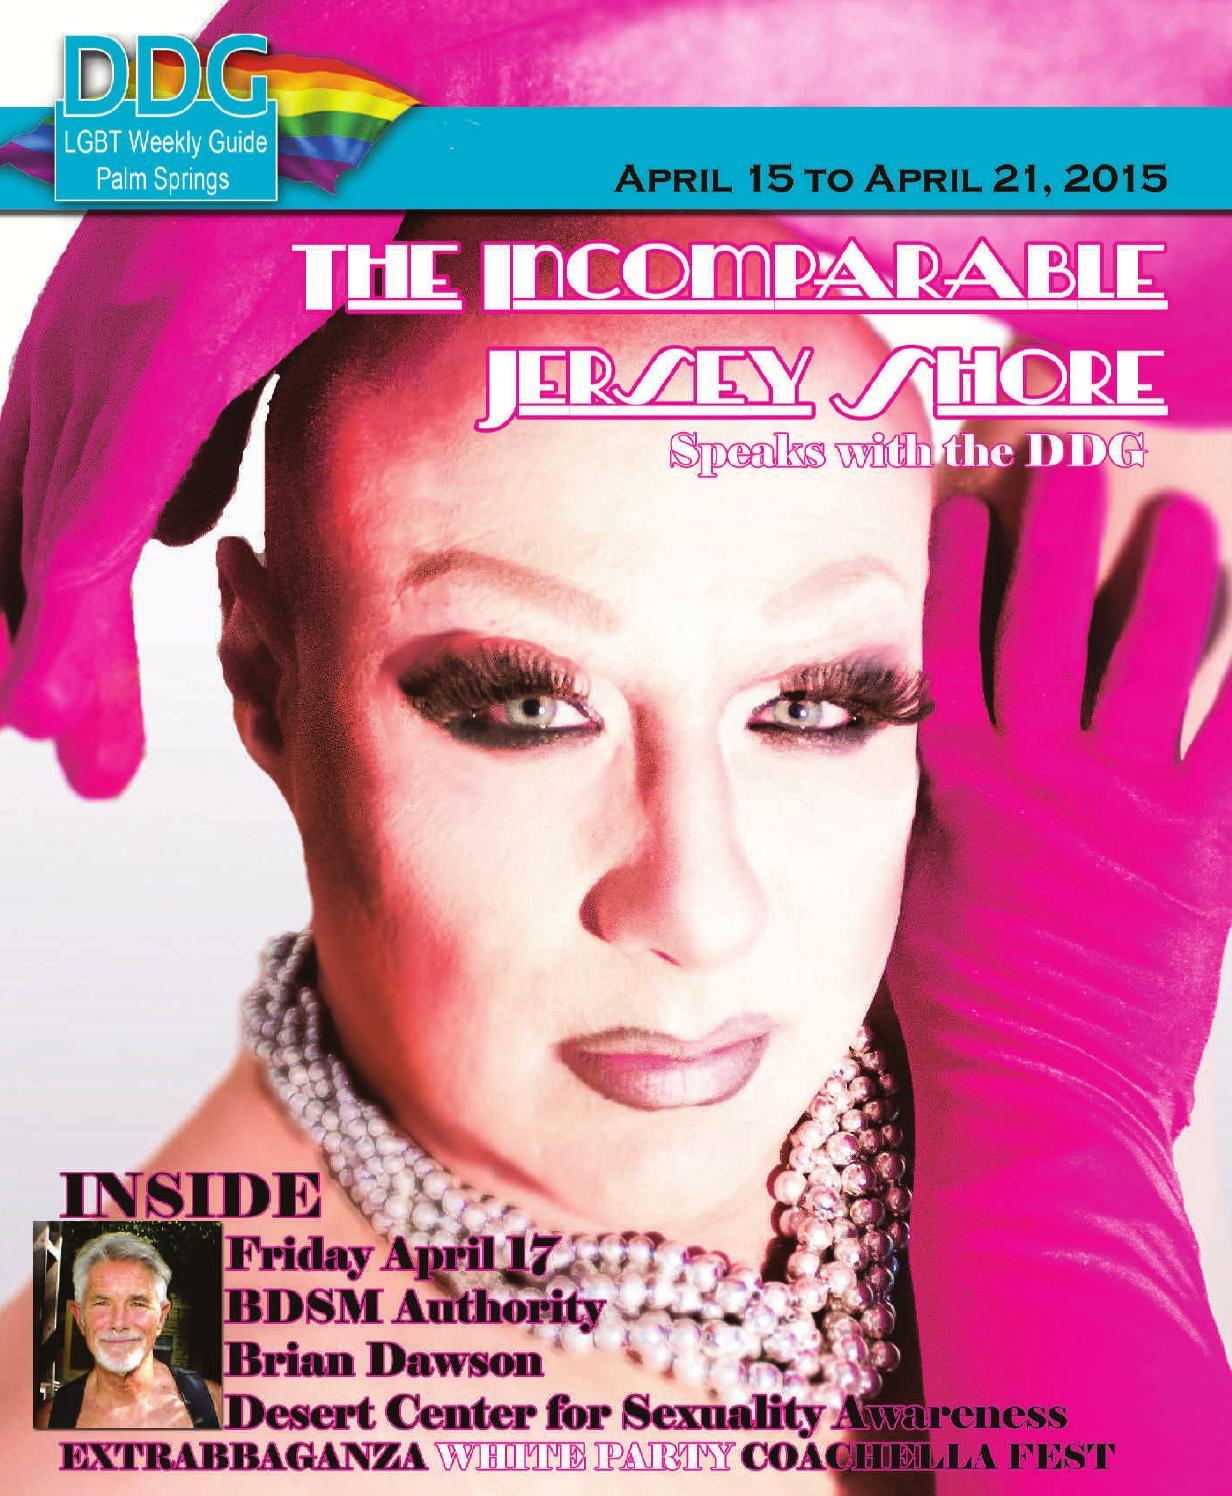 Screen Printing Basics Palm Desert: April 15, 2015 Digital And Print, Gay Desert Guide To The